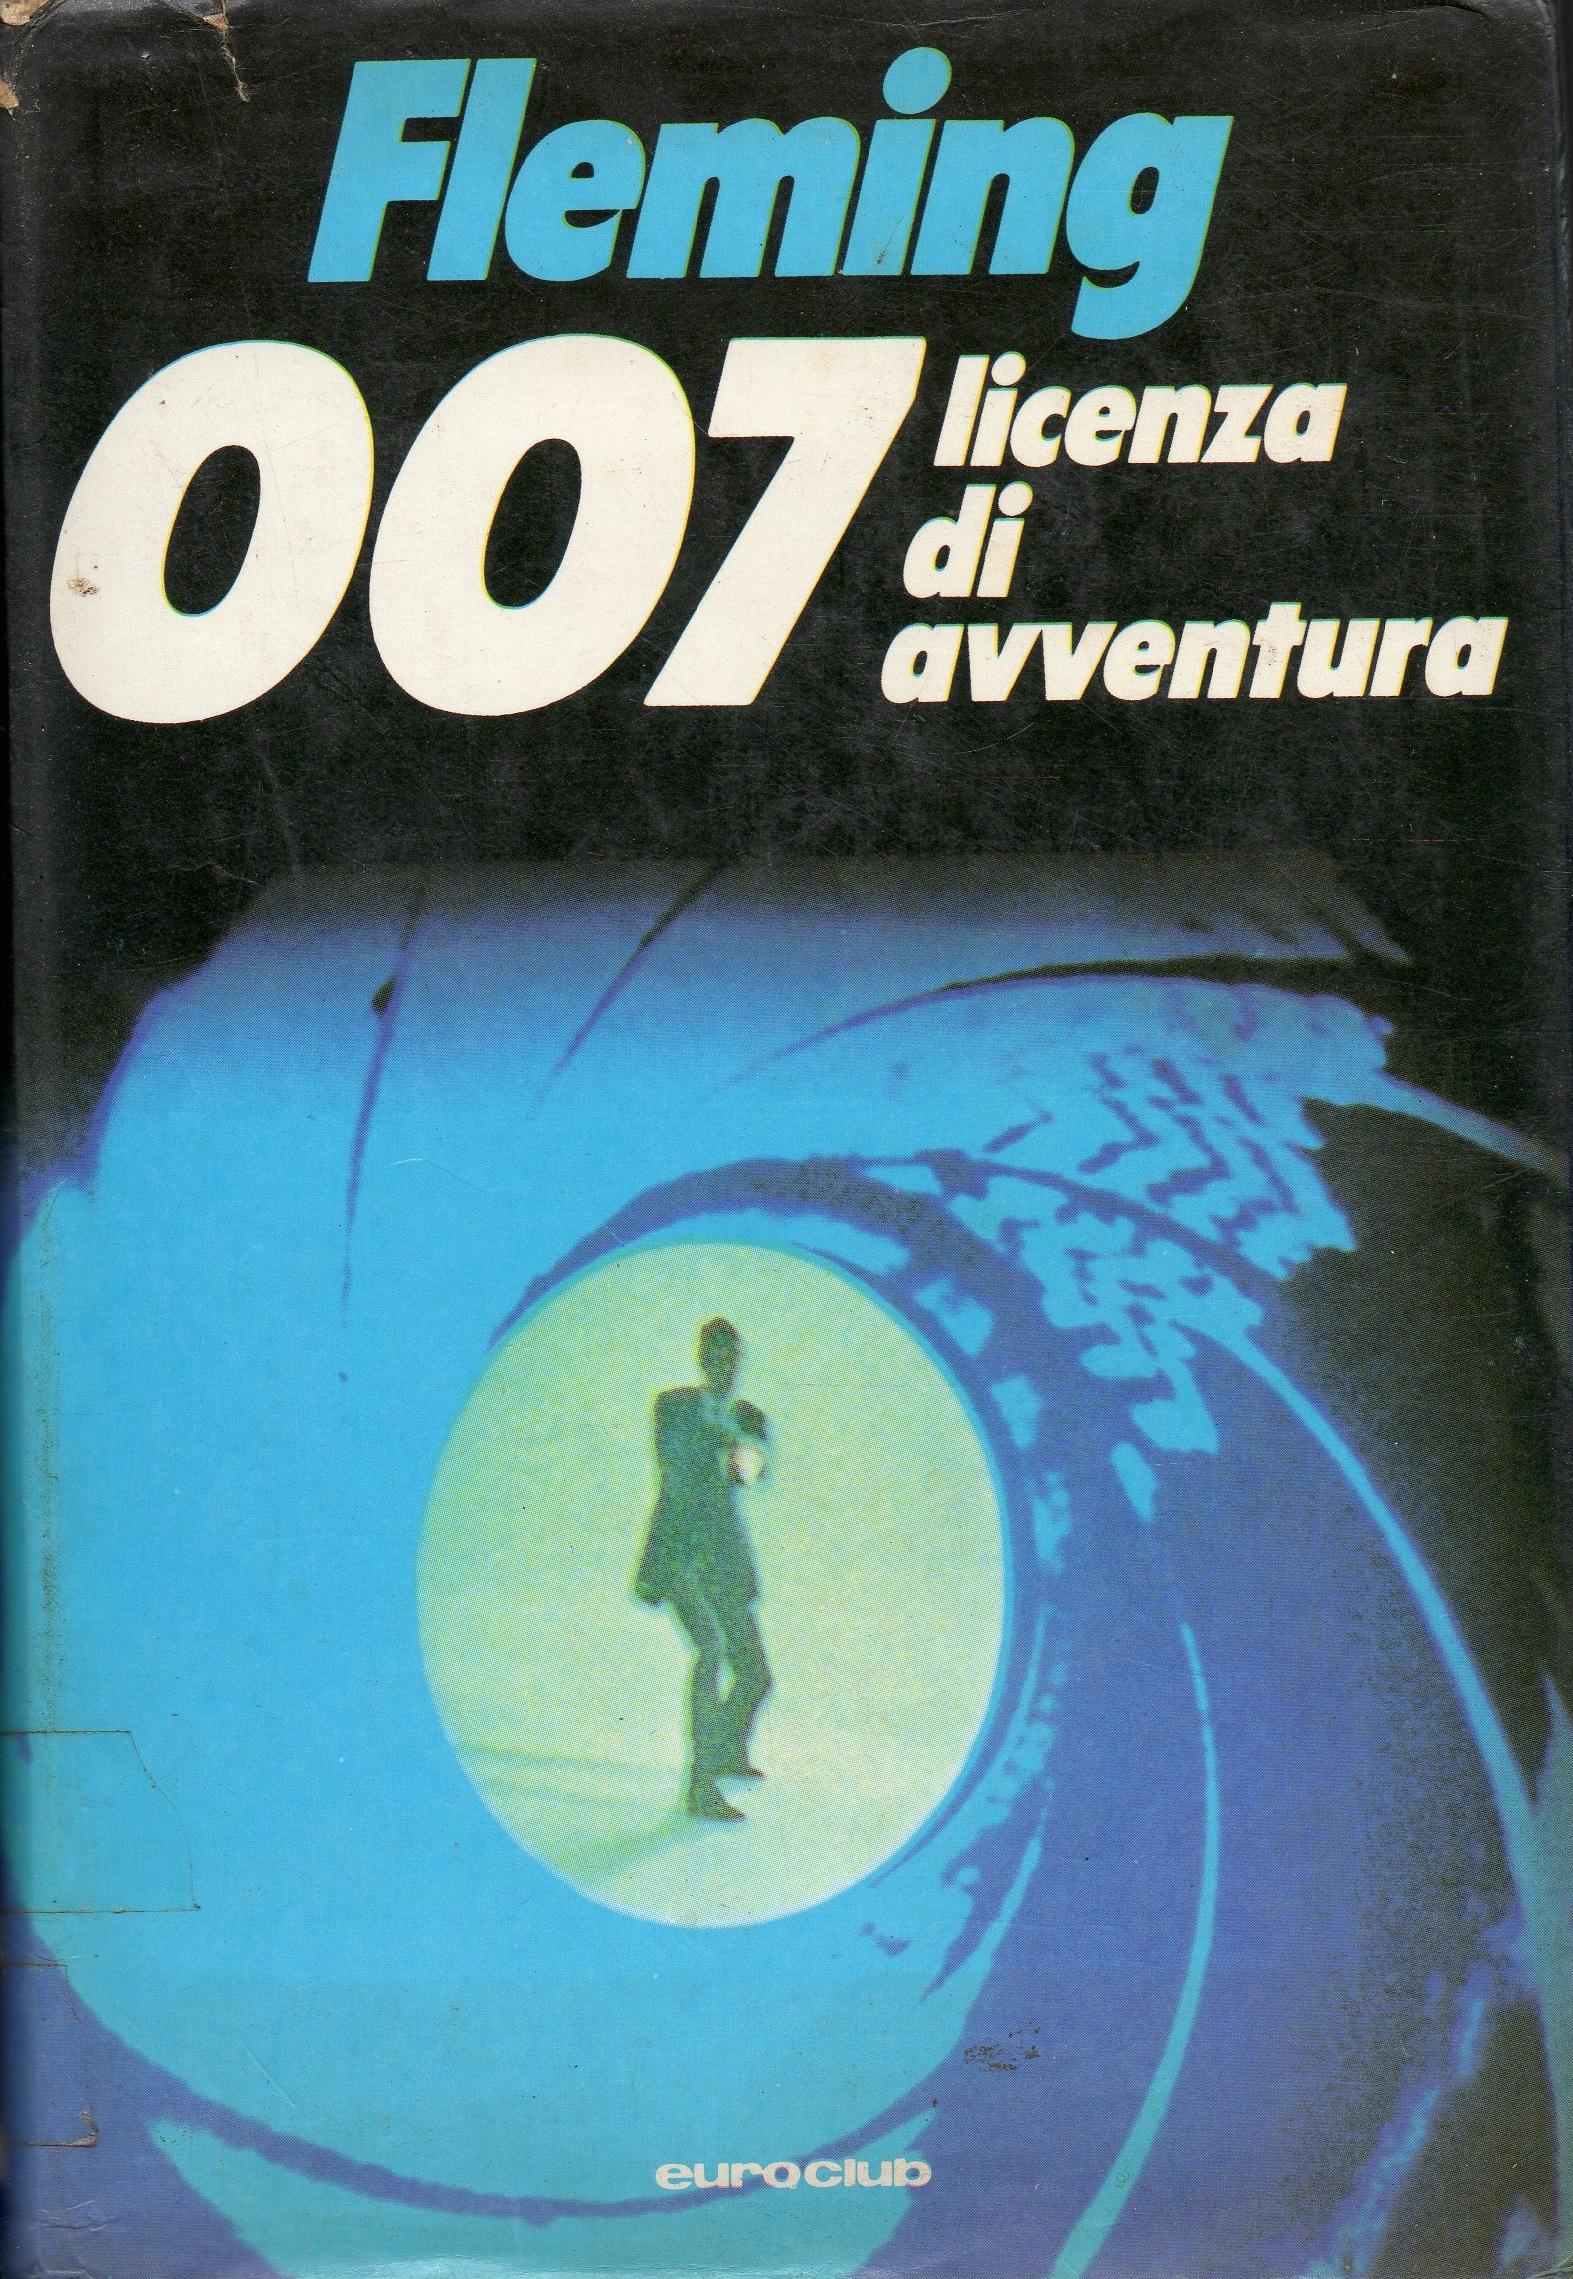 007 licenza d'avventura